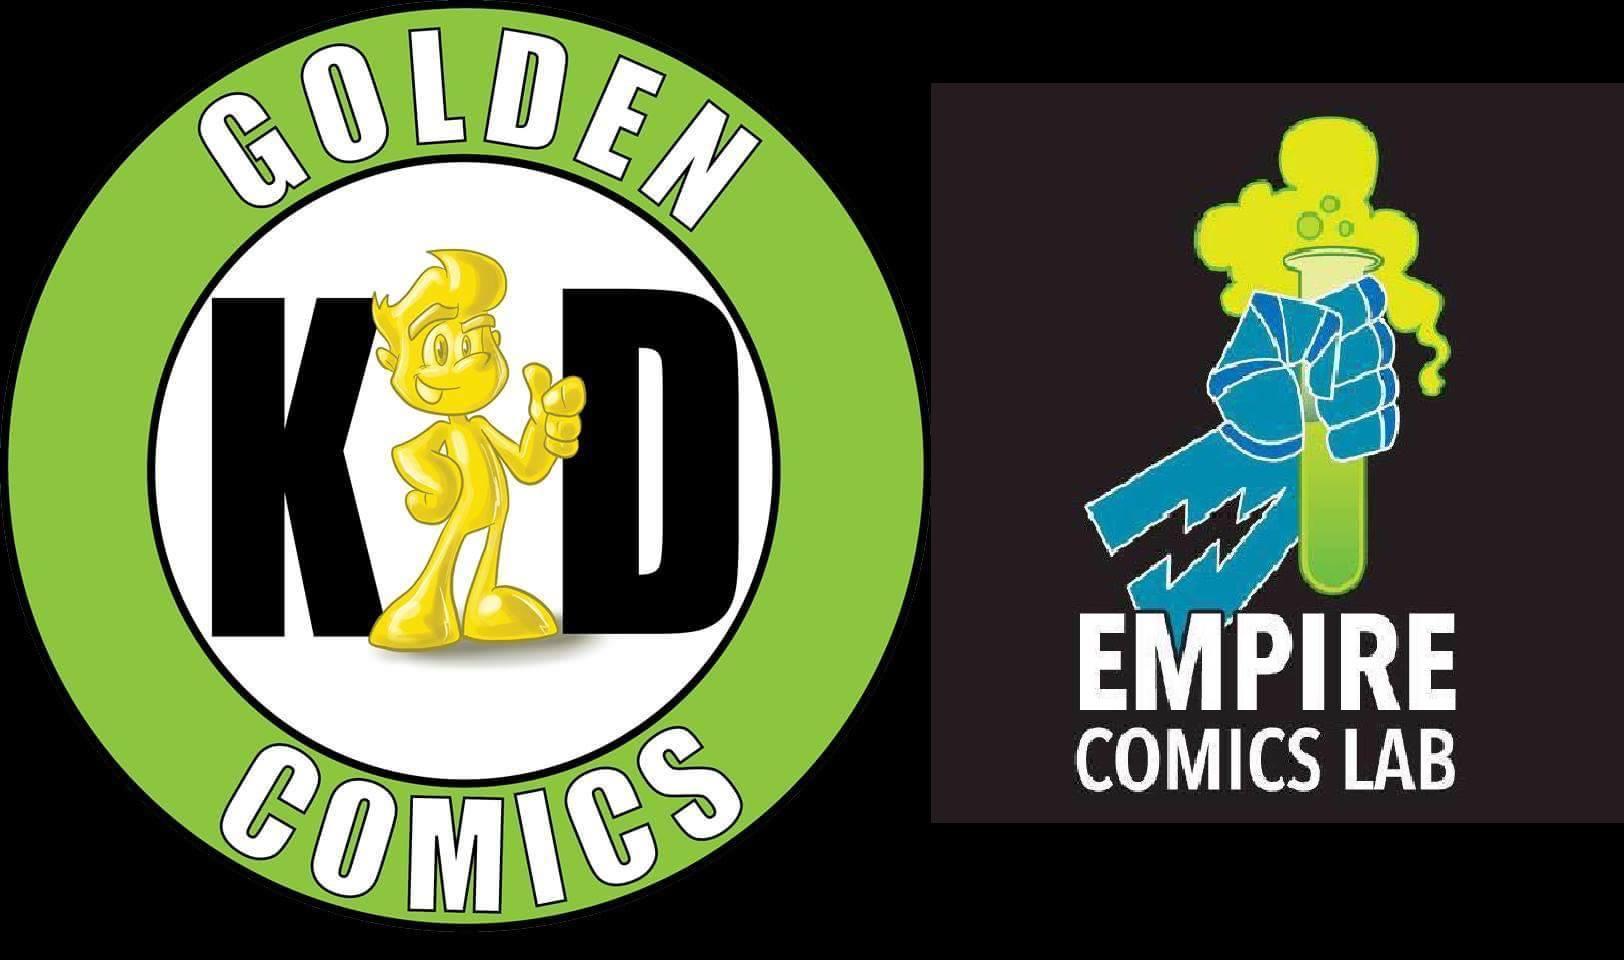 Golden Kid Comics and ECL!